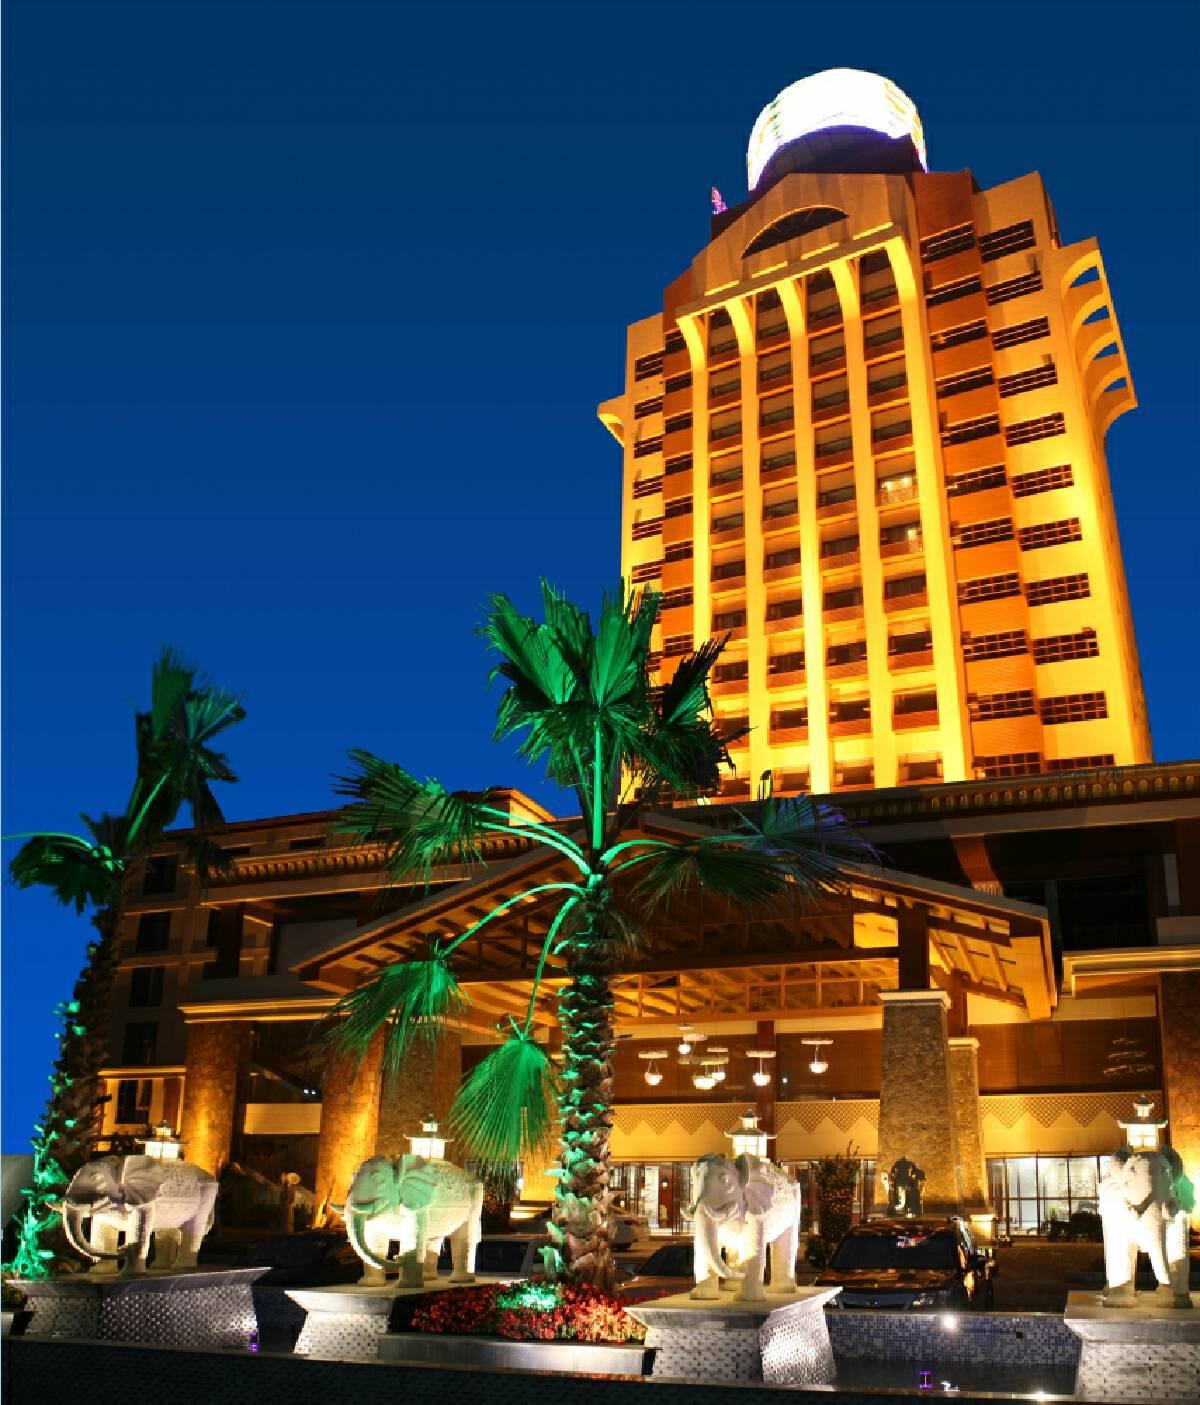 Dusit Princess Hot Springs Resort Fengshun, Guangdong